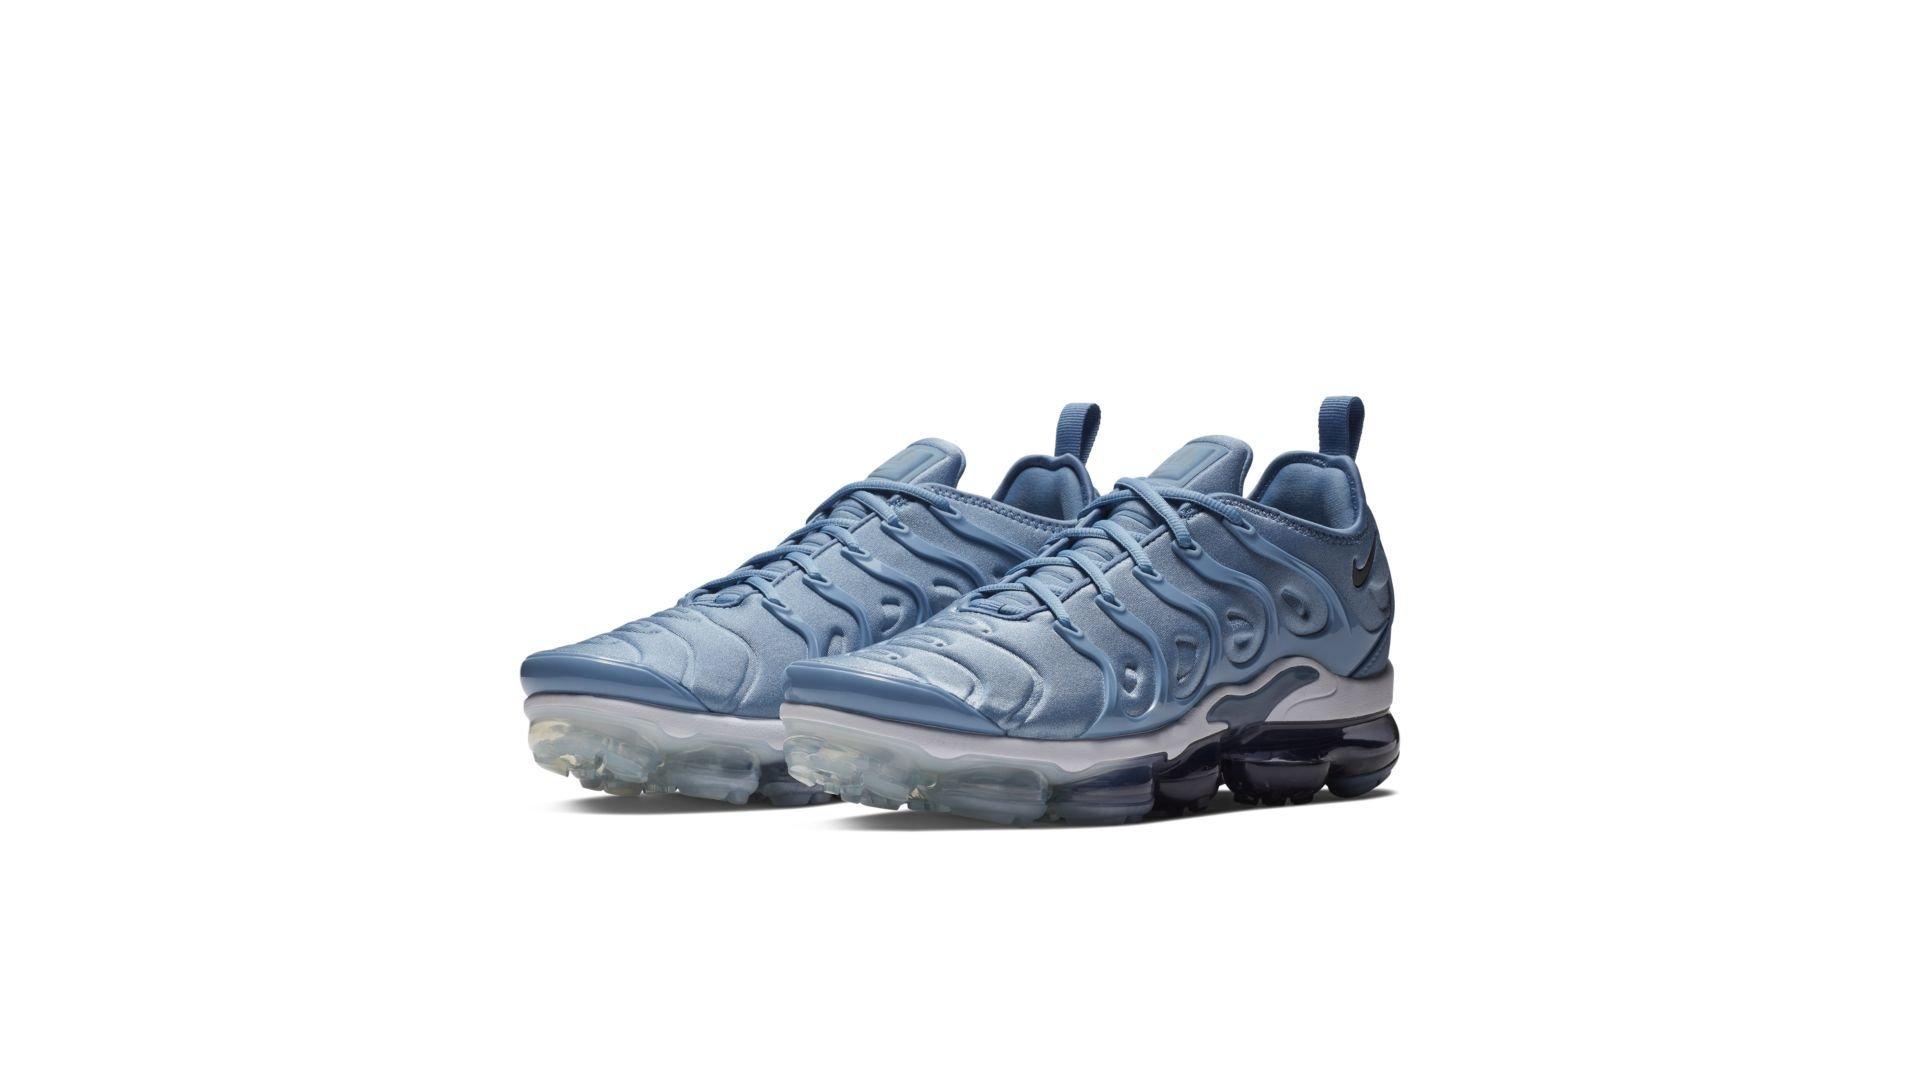 Nike Air Vapormax Plus 'Work Blue' (924453-402)